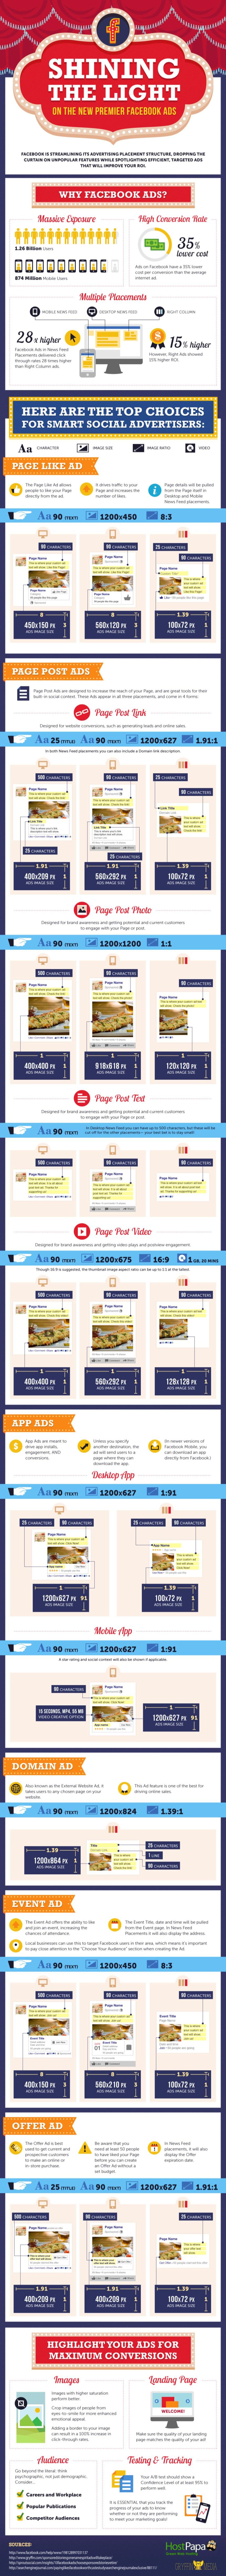 Premier FaceBook Ads #socialmedia #infographic